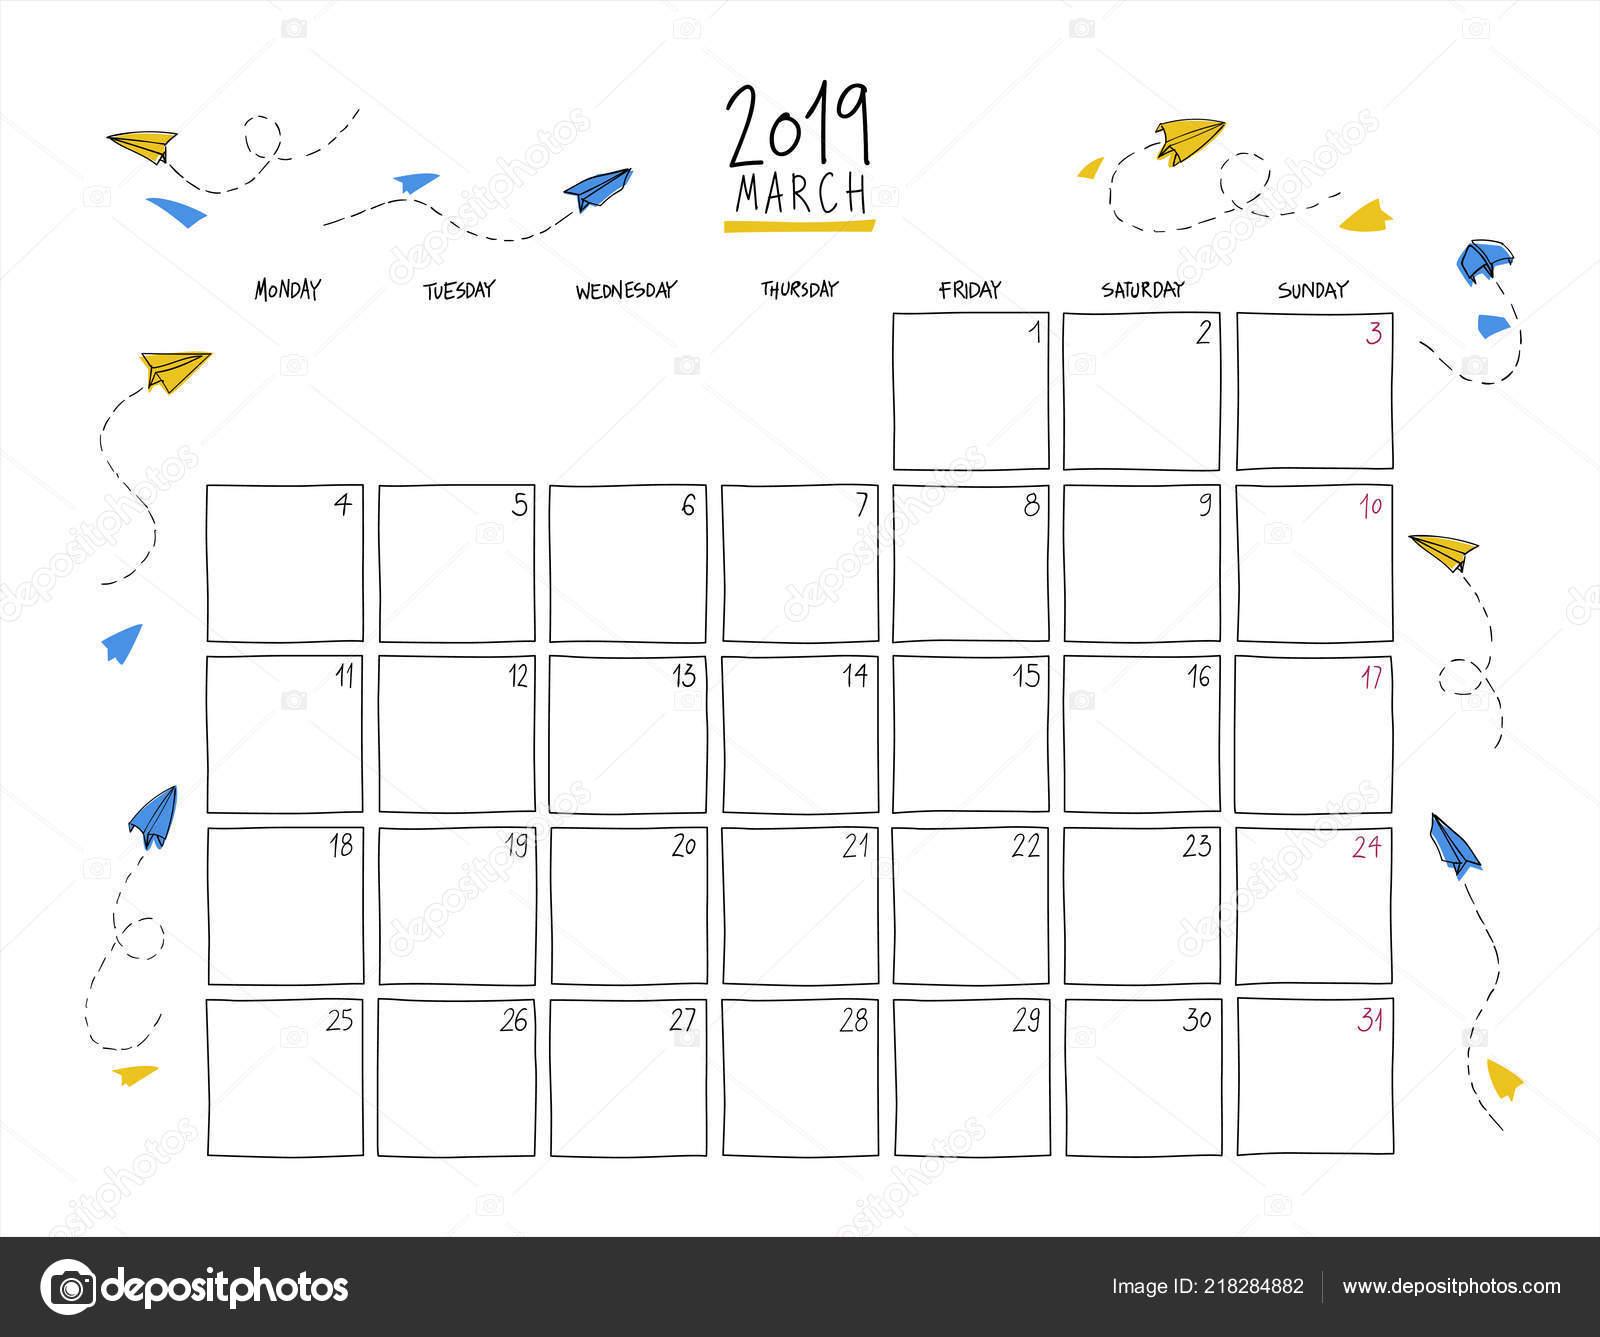 Marzo Calendario.Calendario Parete Marzo 2019 Schizzo Variopinto Orizzontale Modello